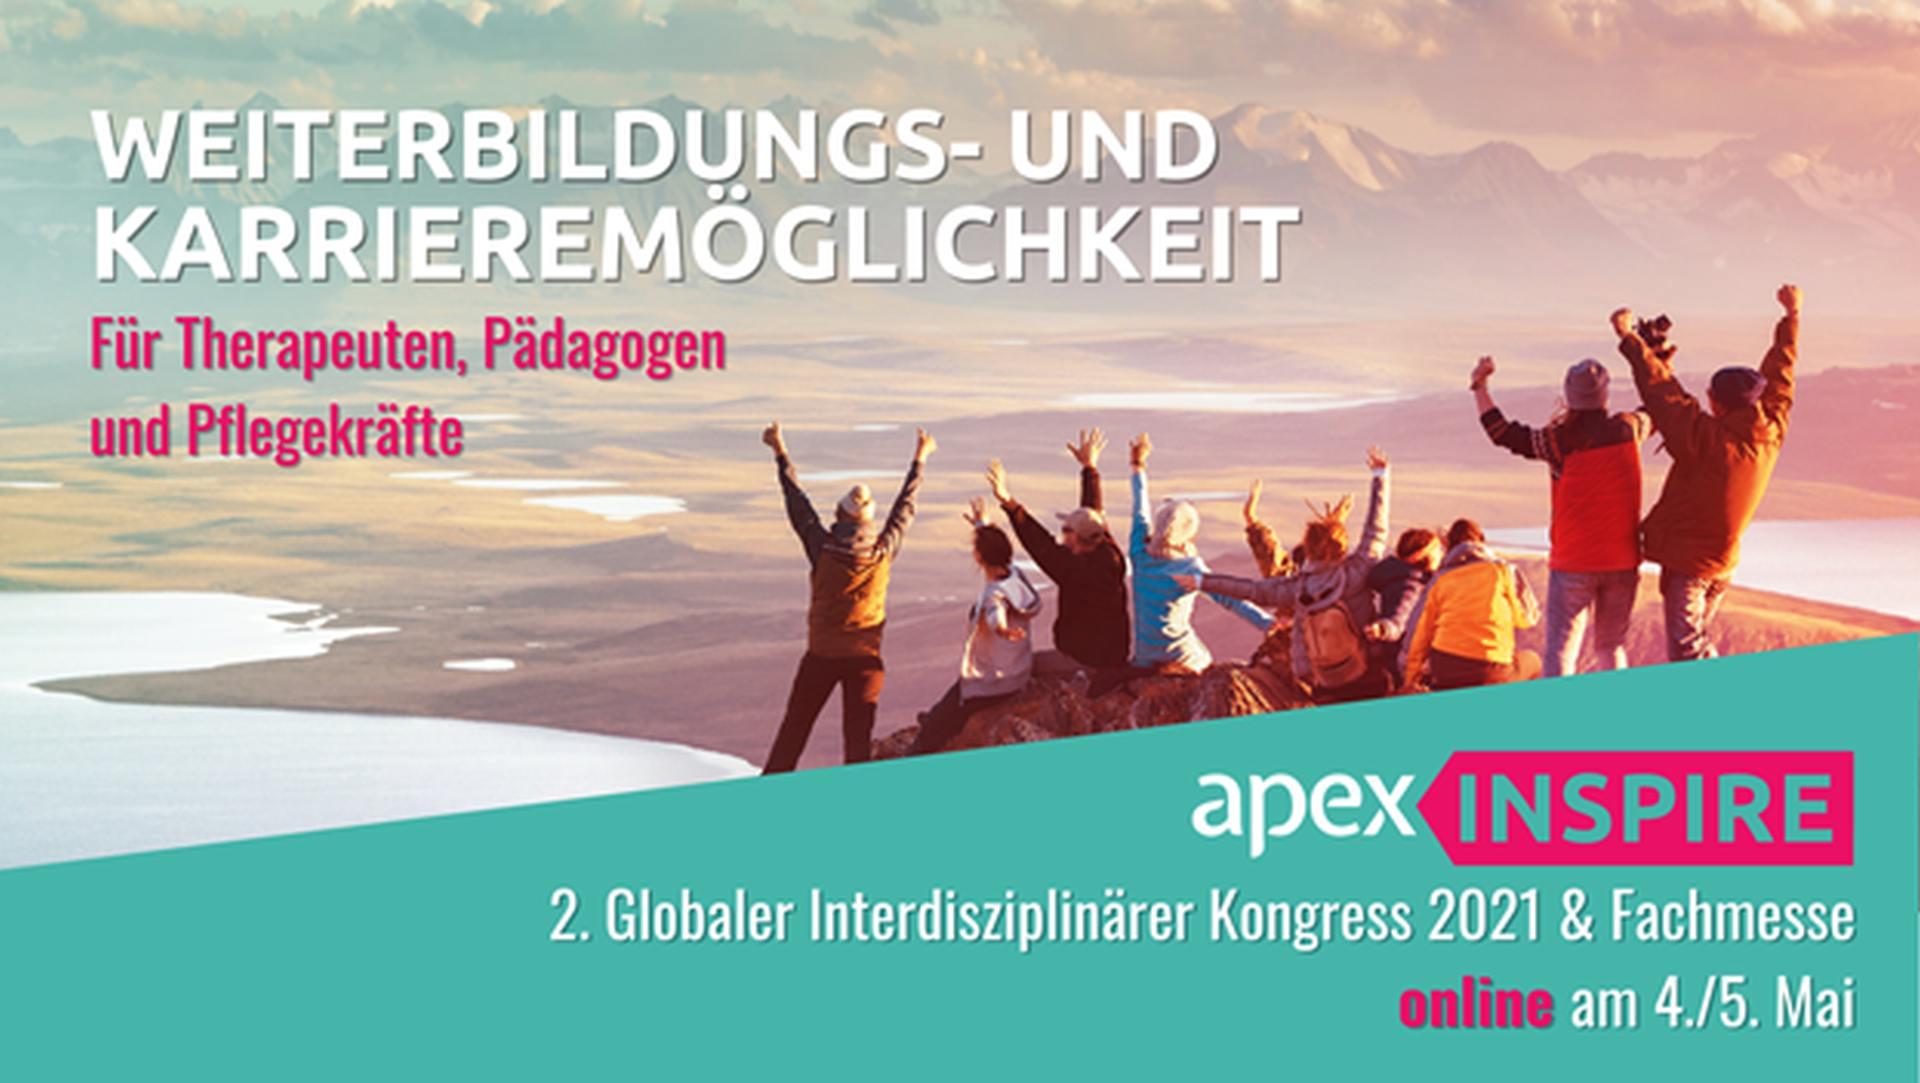 Apex Inspire Kongress